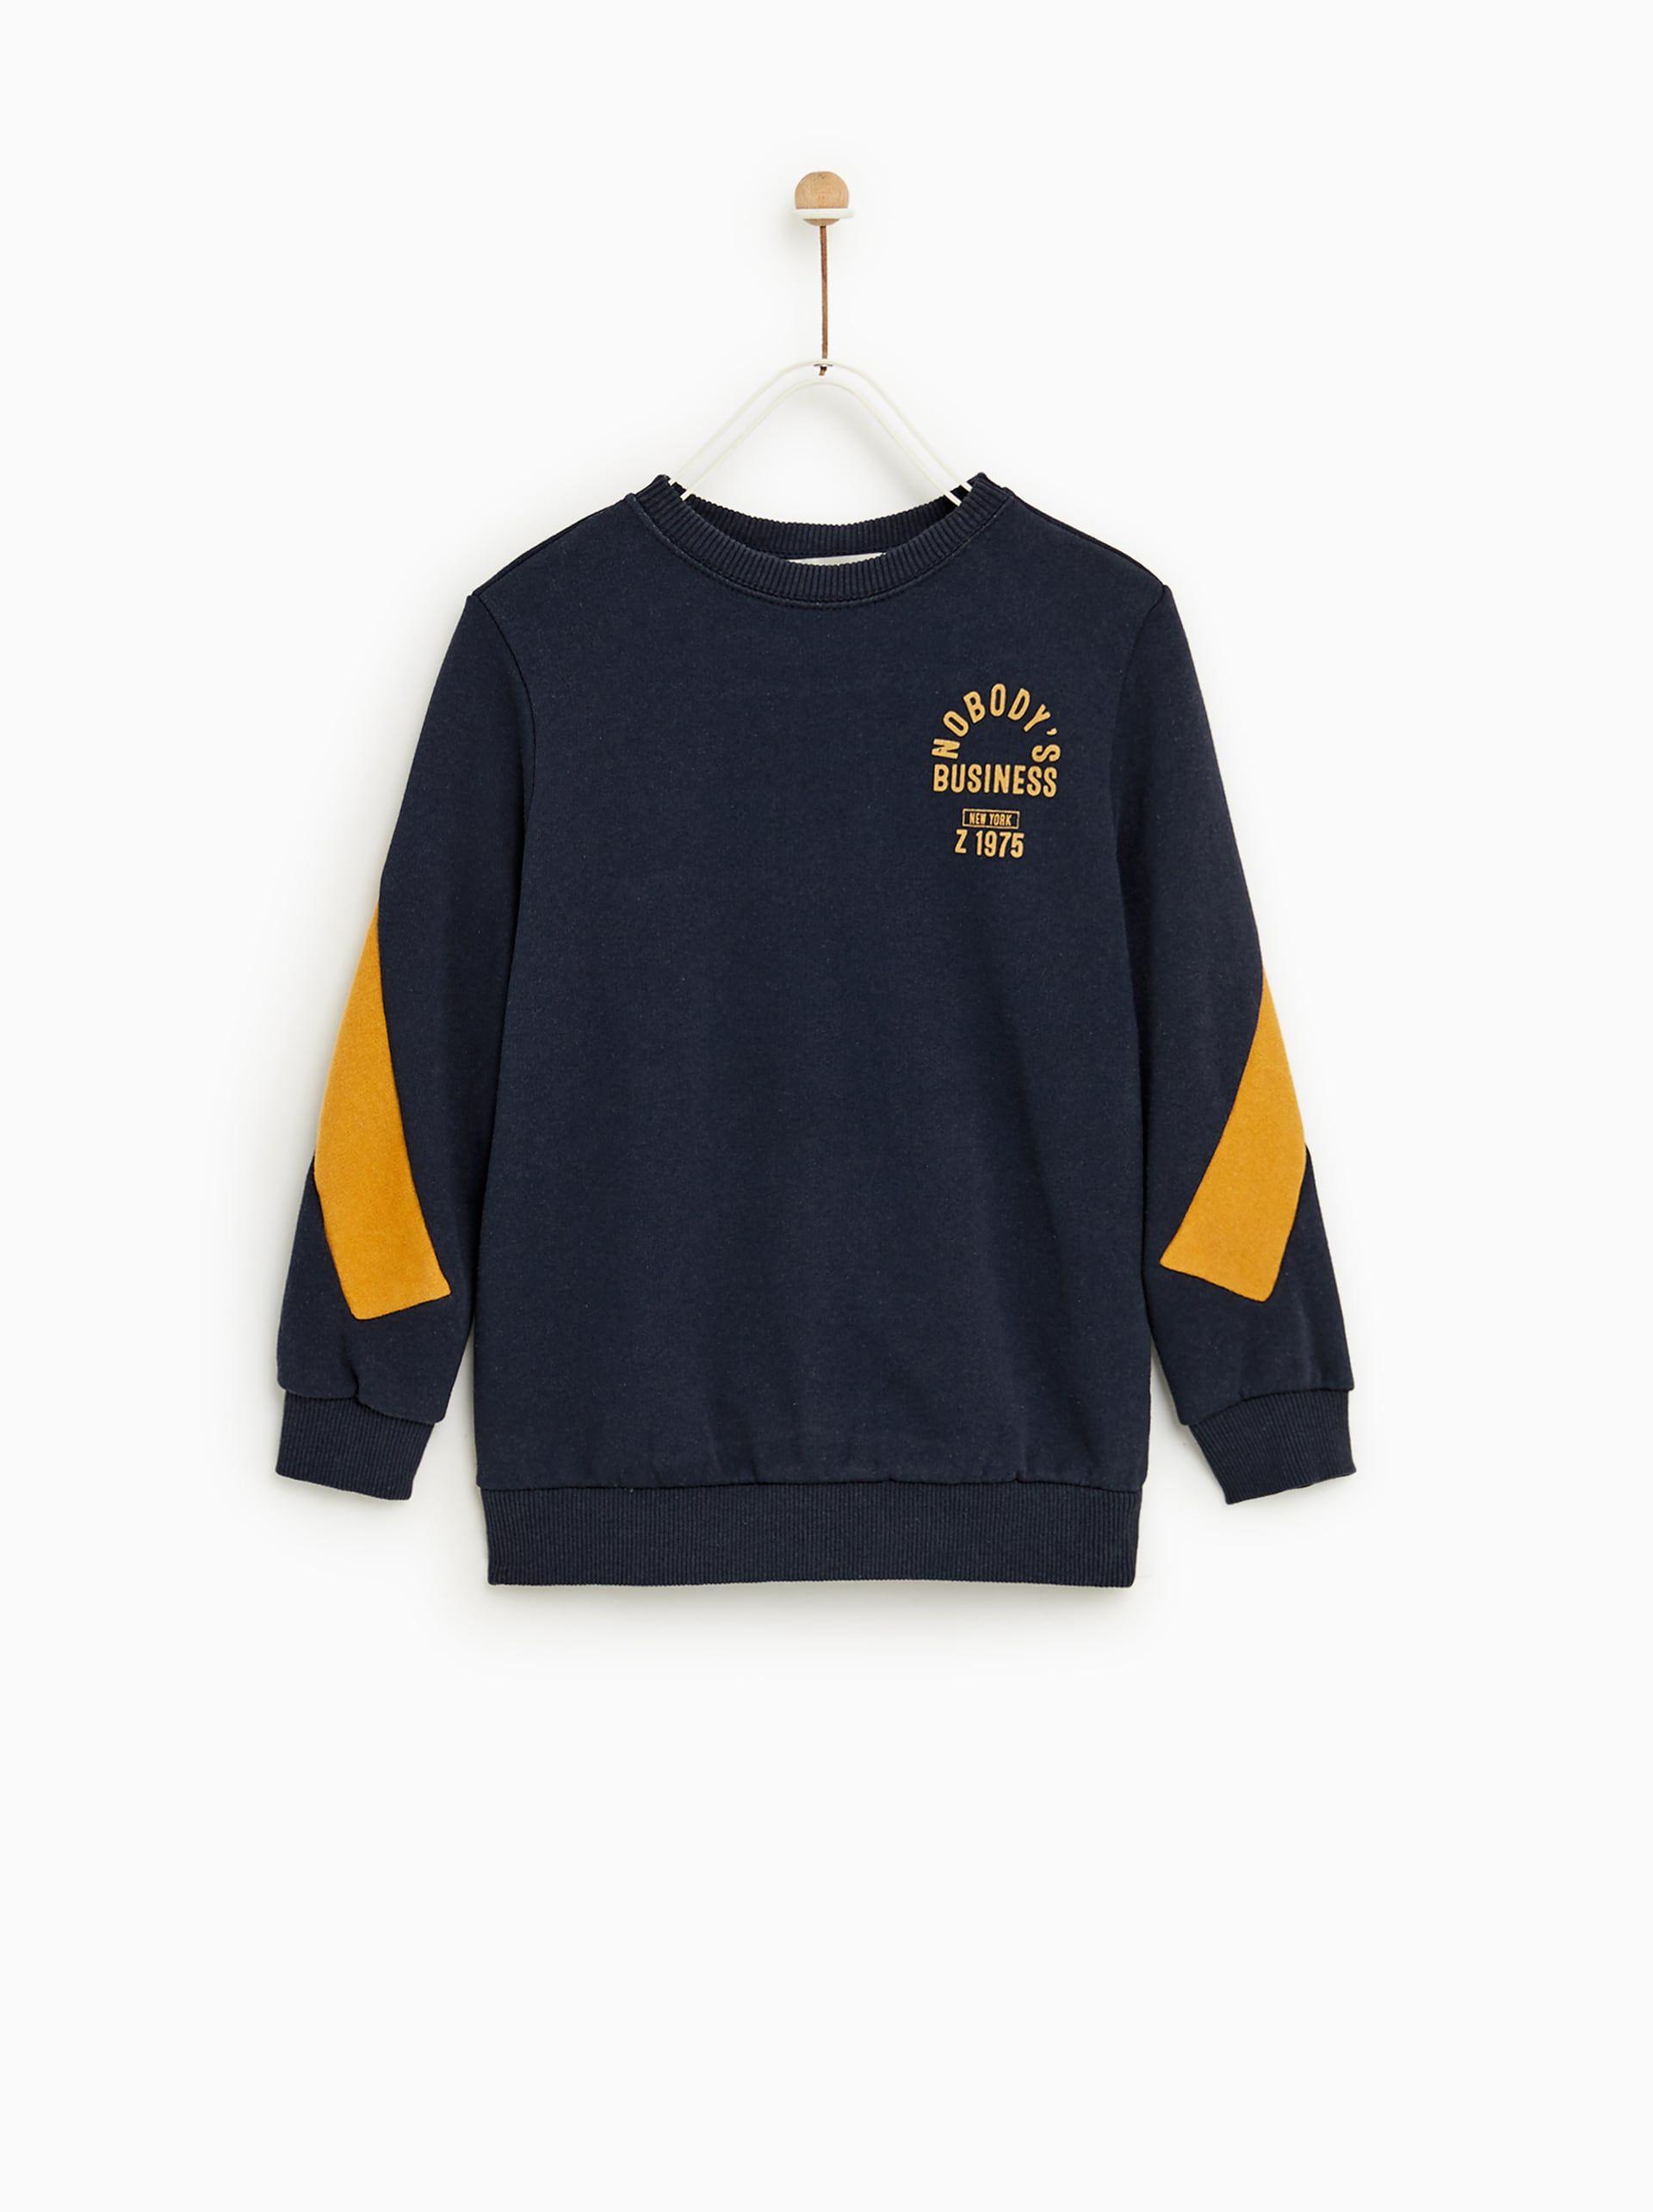 8d264767 SWEATSHIRT WITH STRIPES | D2-KB in 2019 | Printed sweatshirts, Zara ...